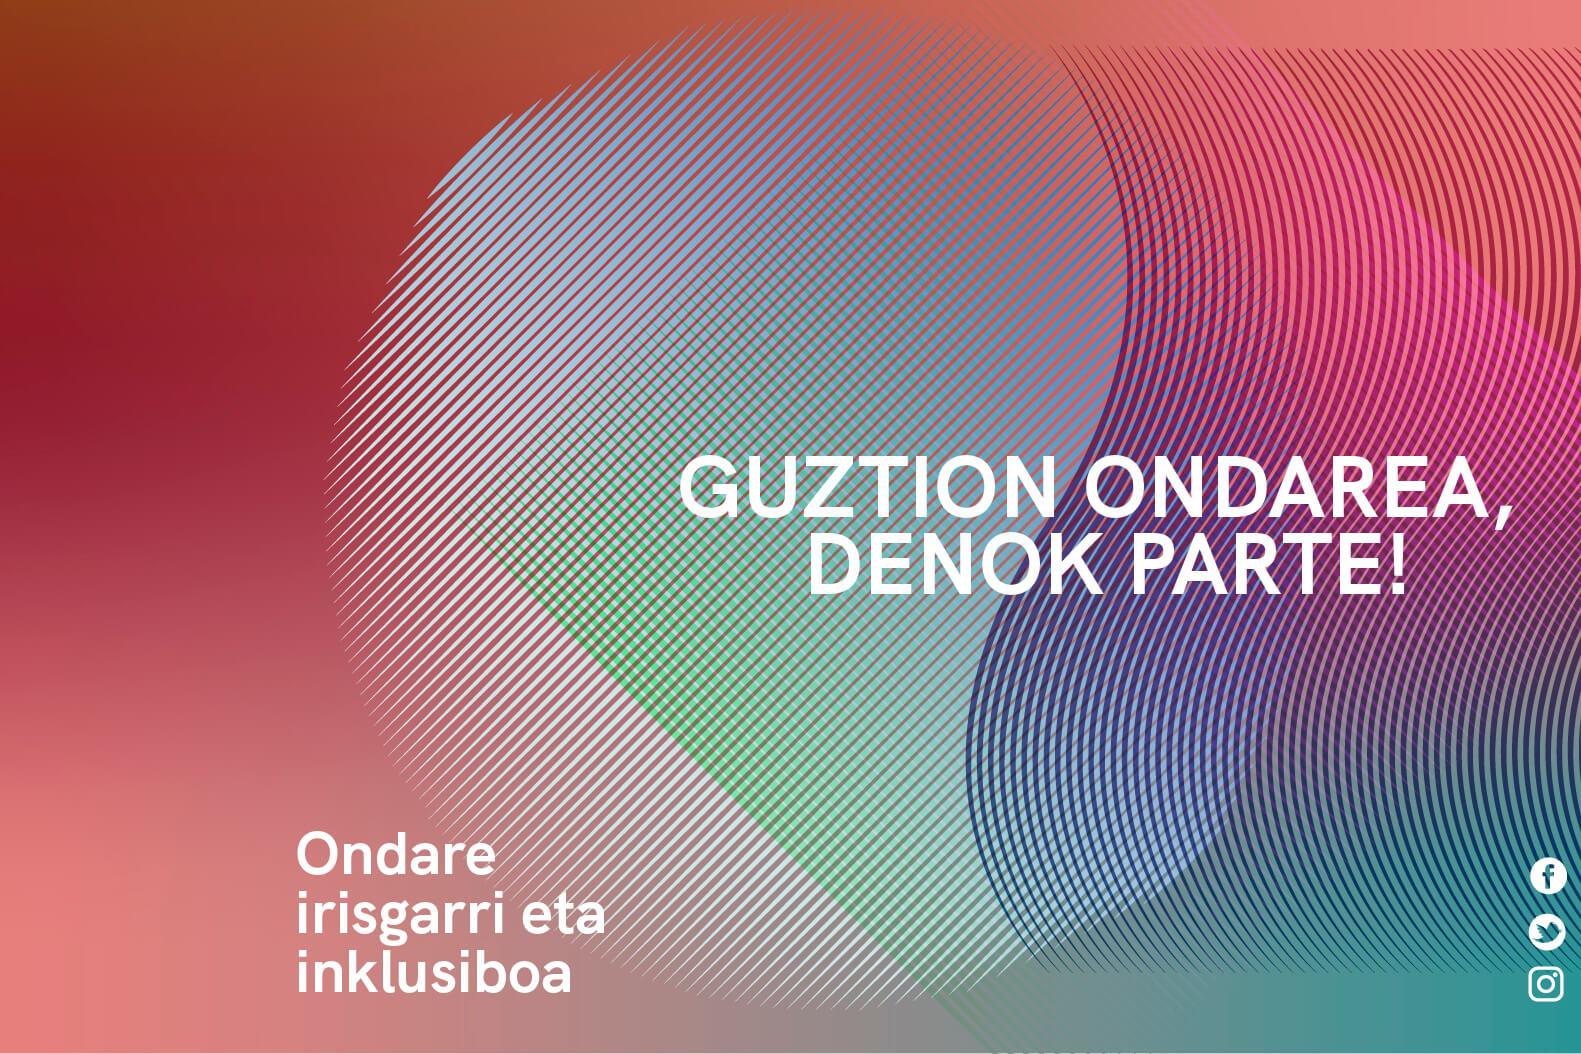 JEP 2021 Guztion Ondarea, Denok Parte!